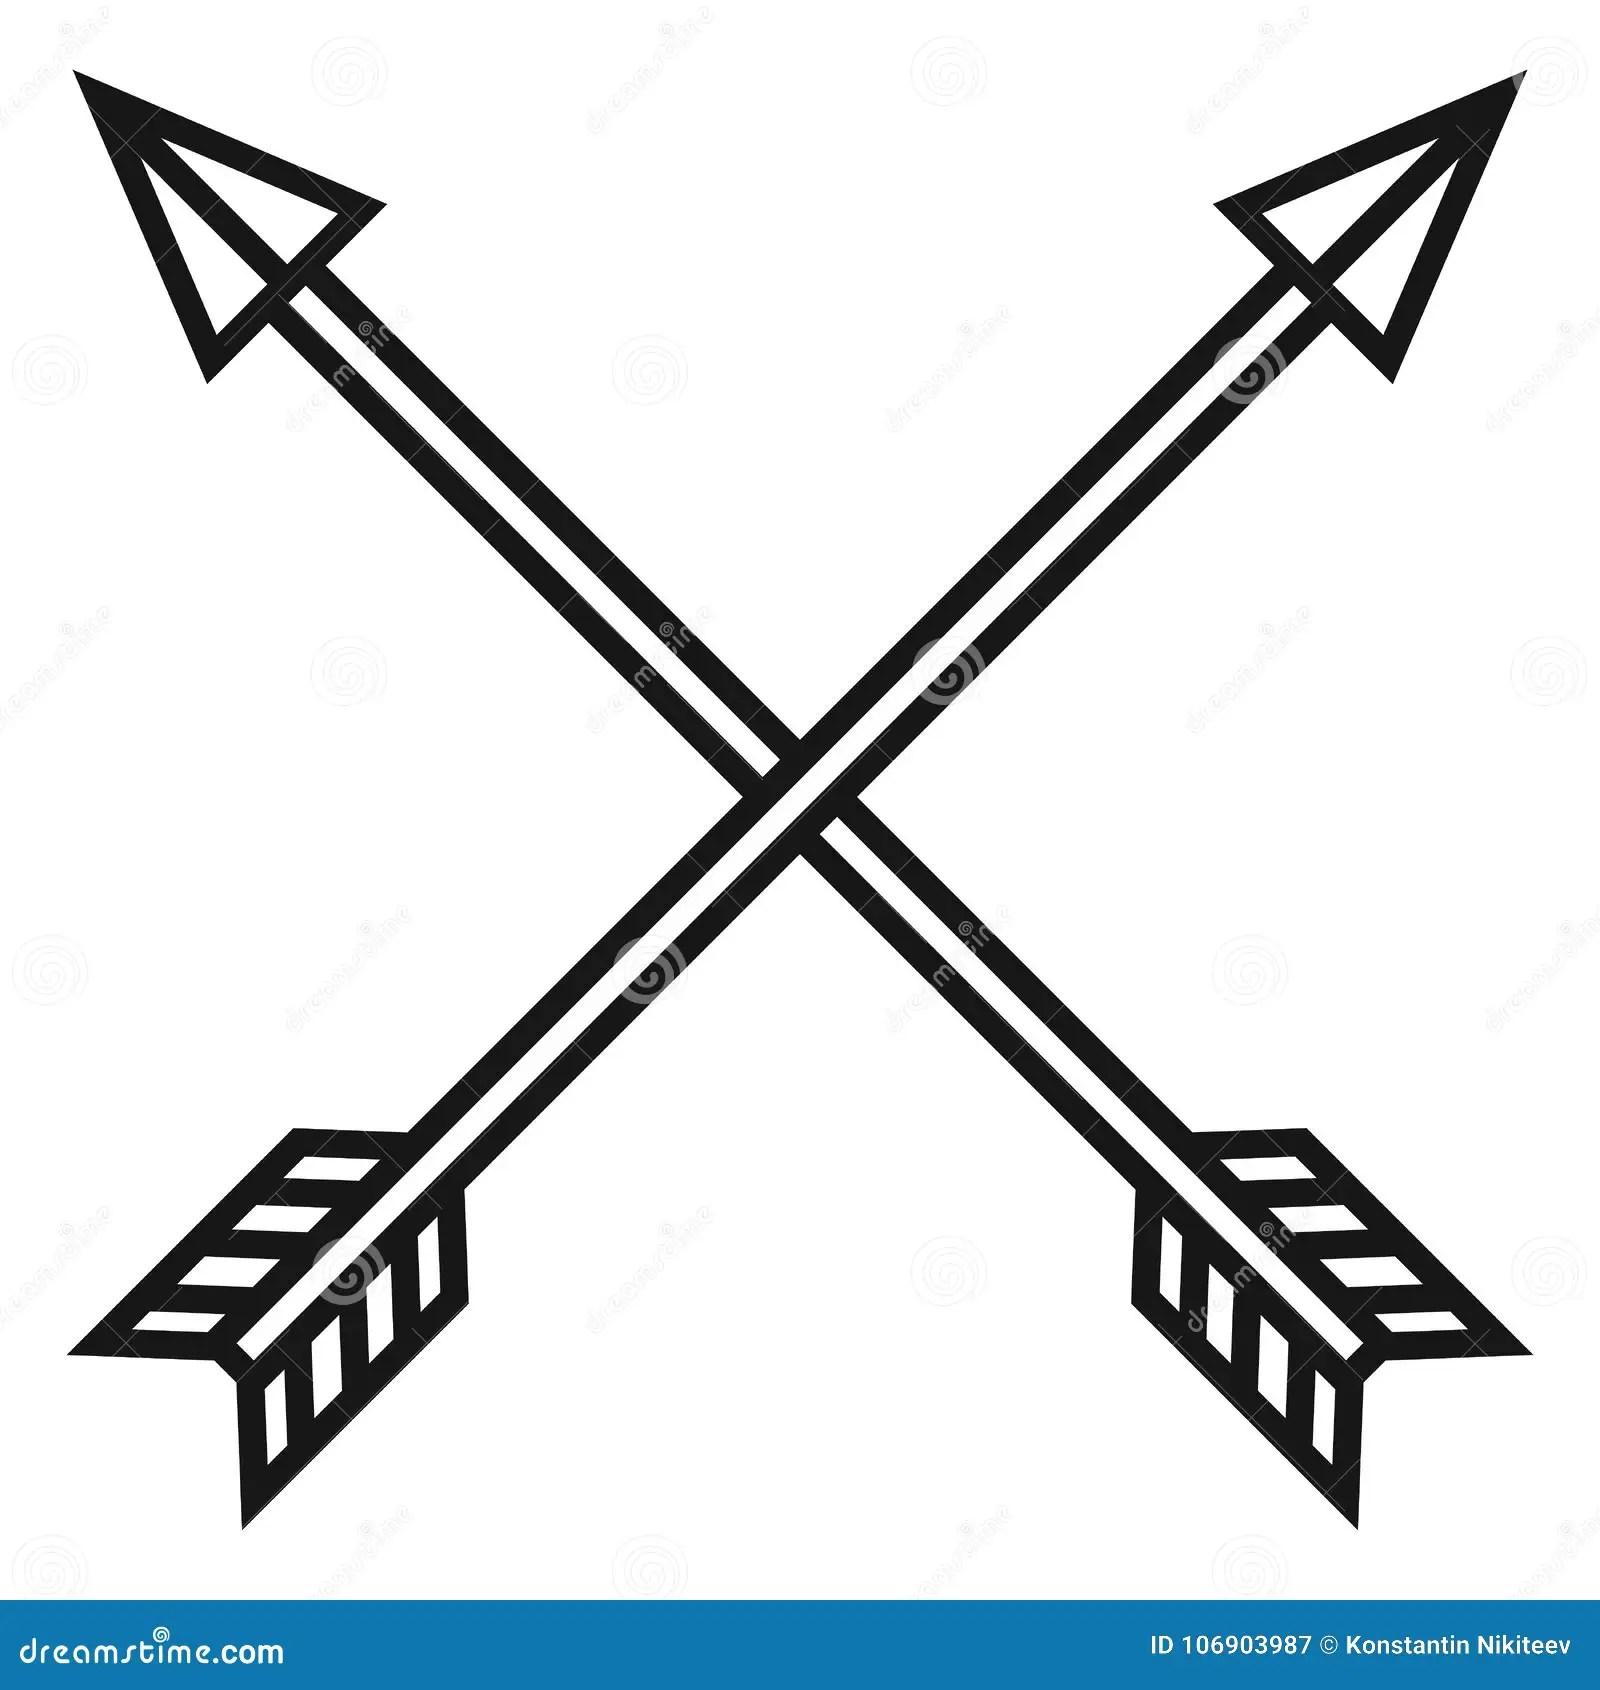 Vector Black Me Val Icon Of Crossed Arrows Stock